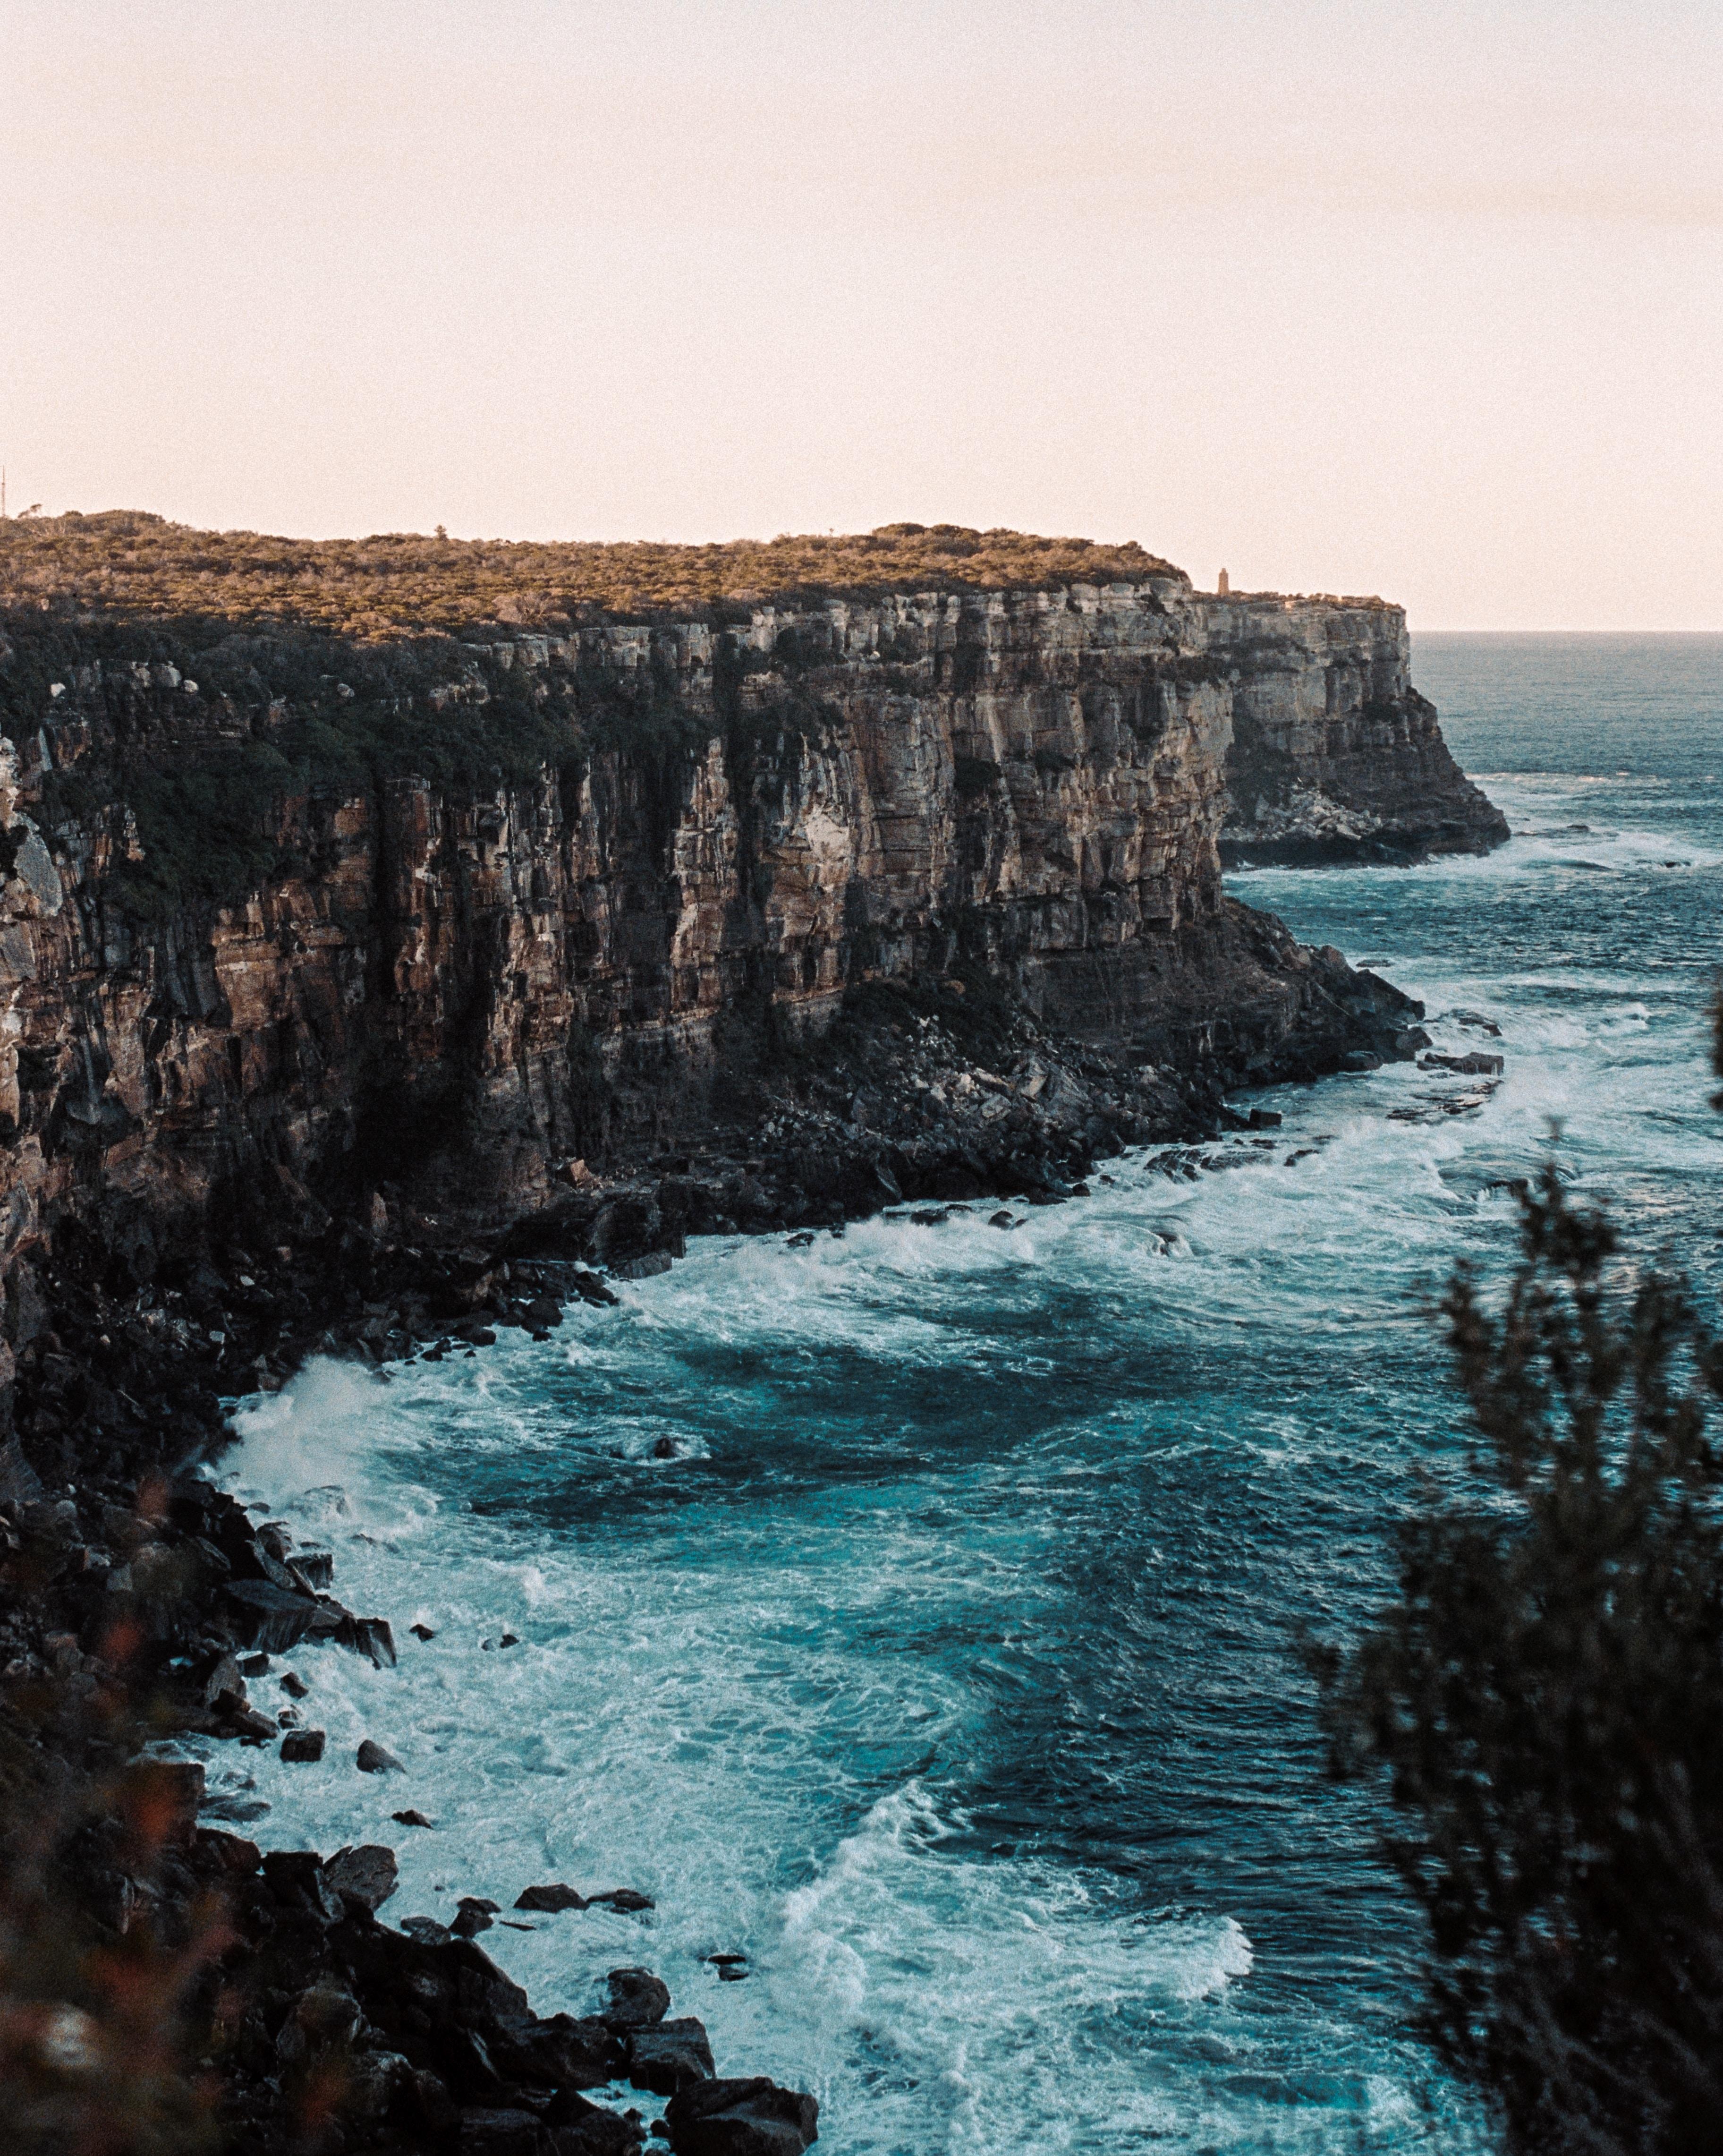 brown cliff near shoreline